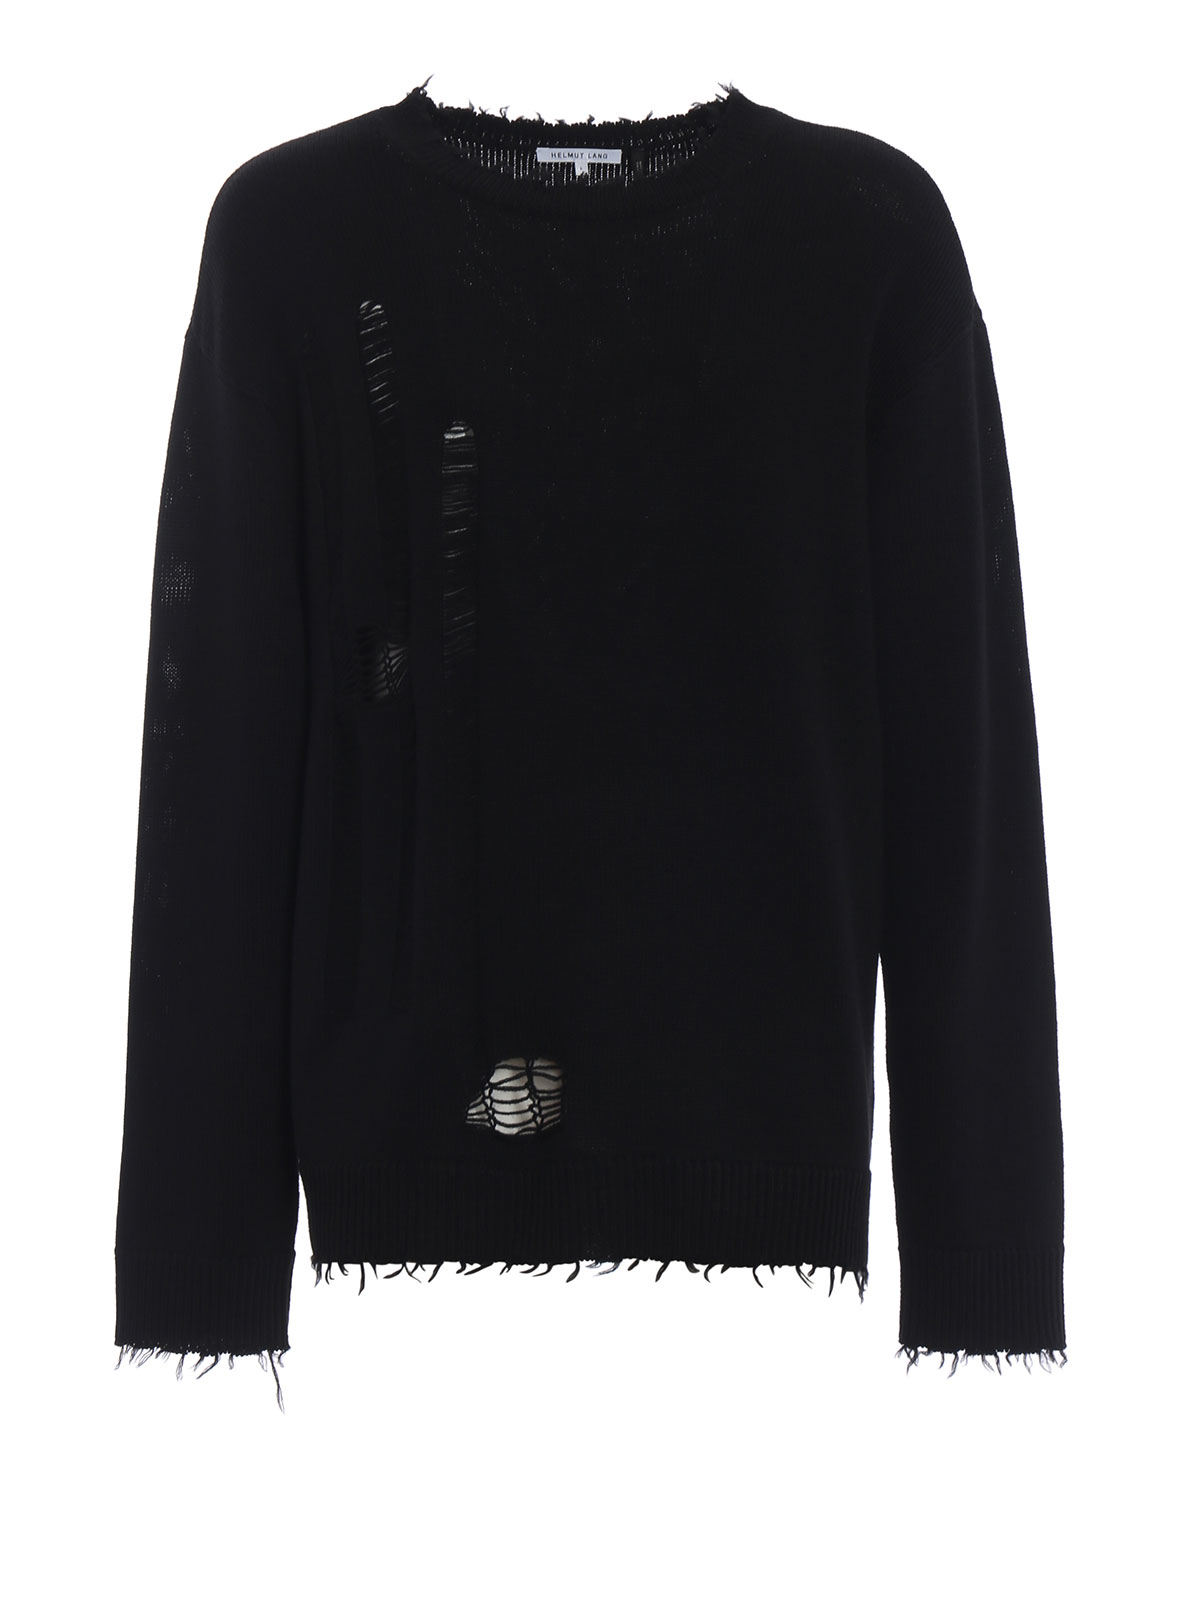 30e698fcb4ccb Helmut Lang - Distressed black wool sweater - crew necks - I05HM702001